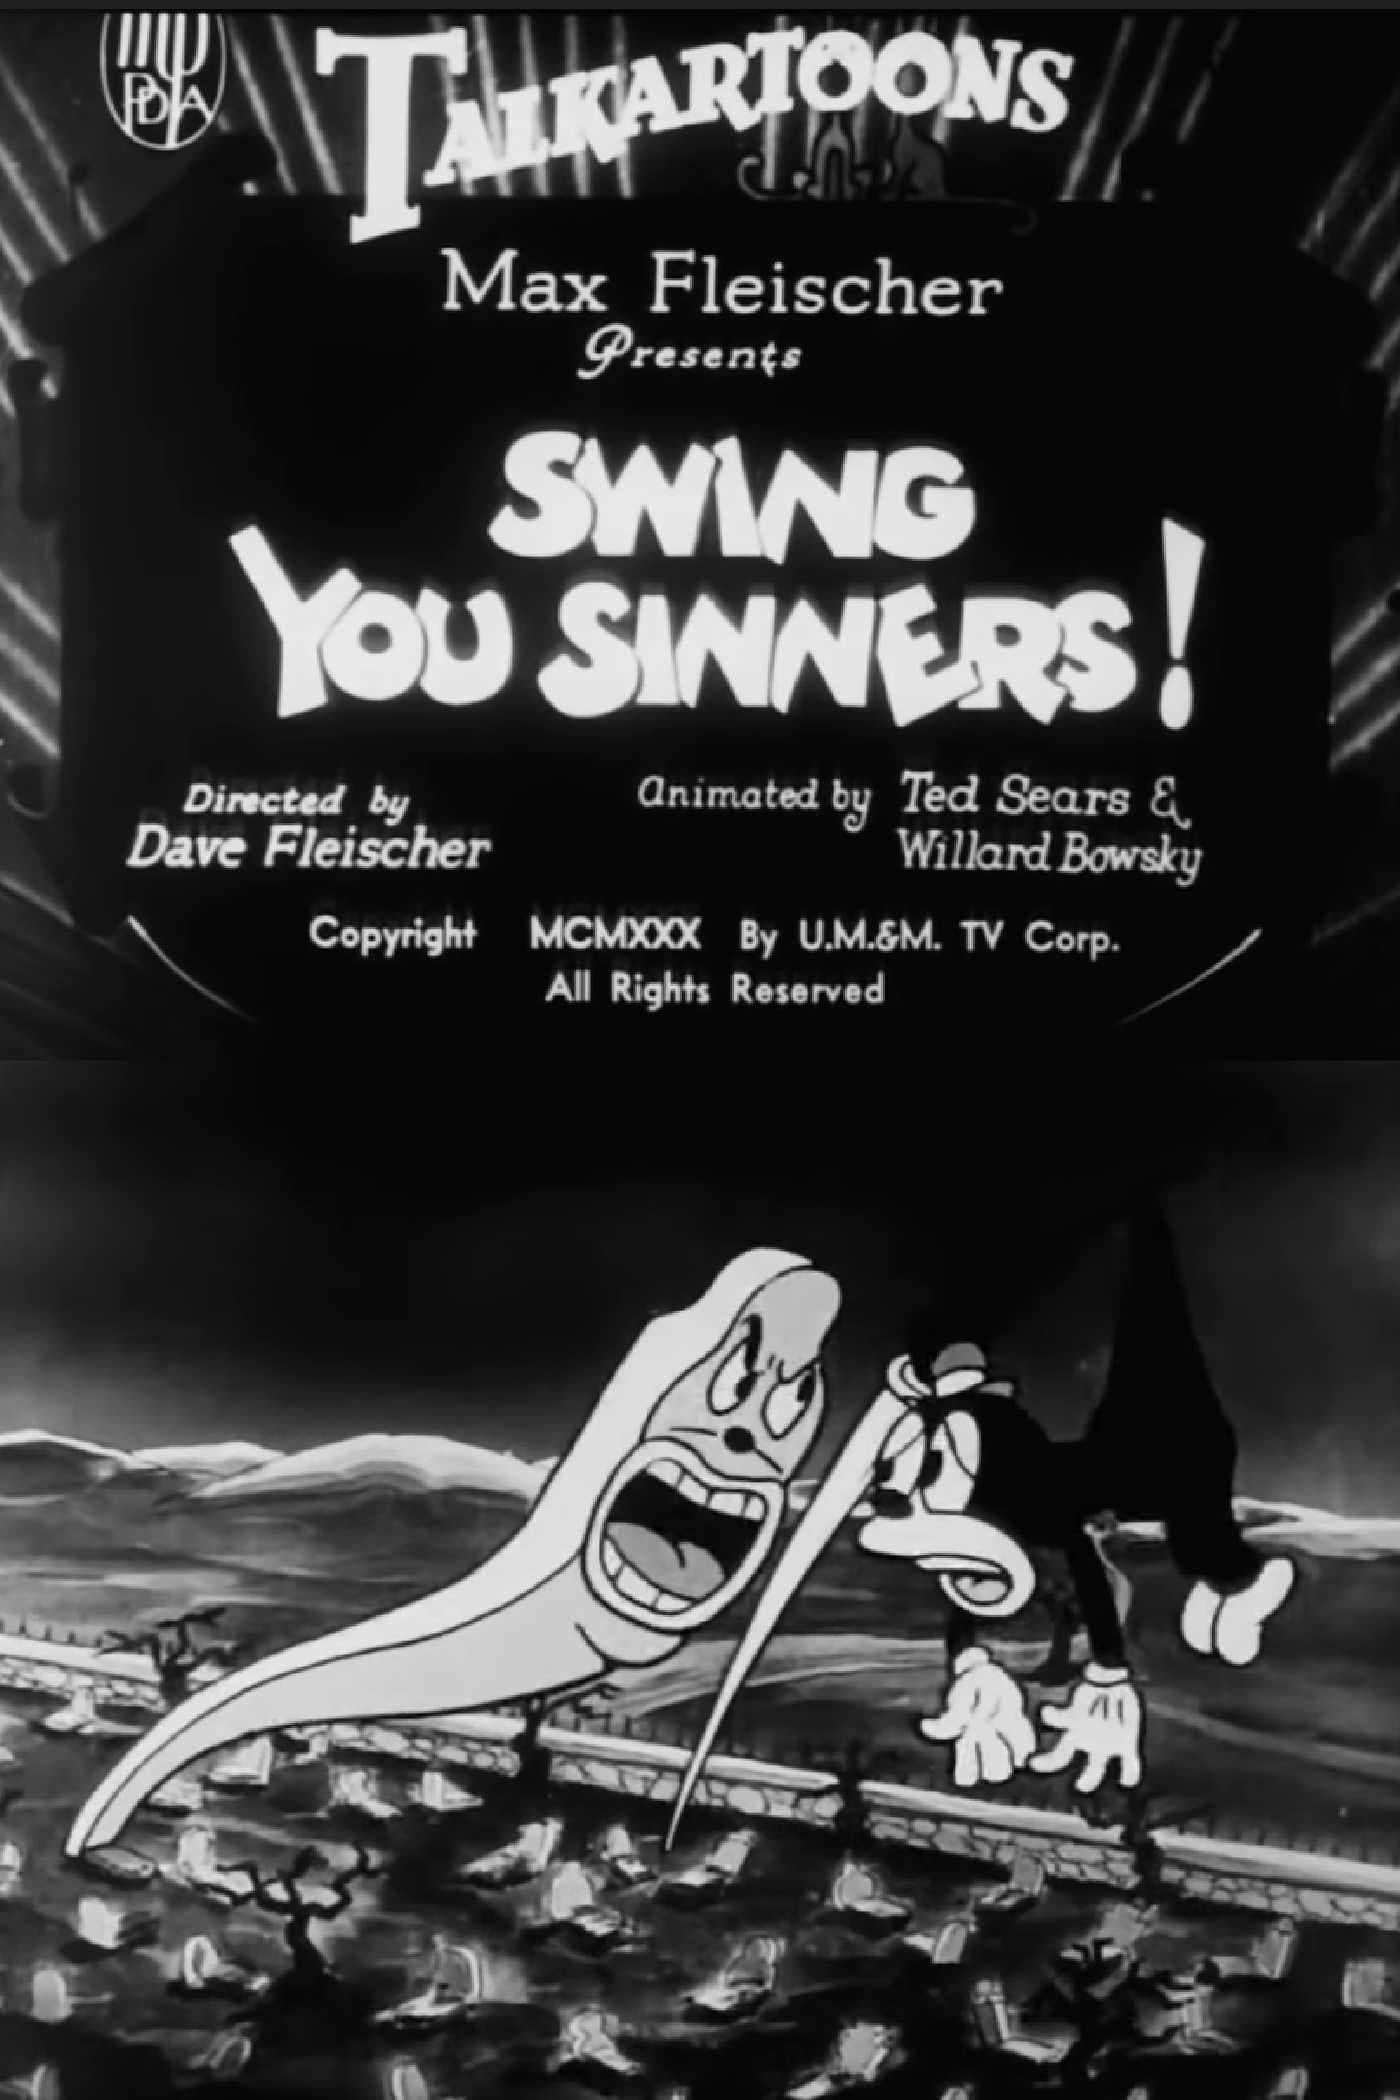 Swing You Sinners!